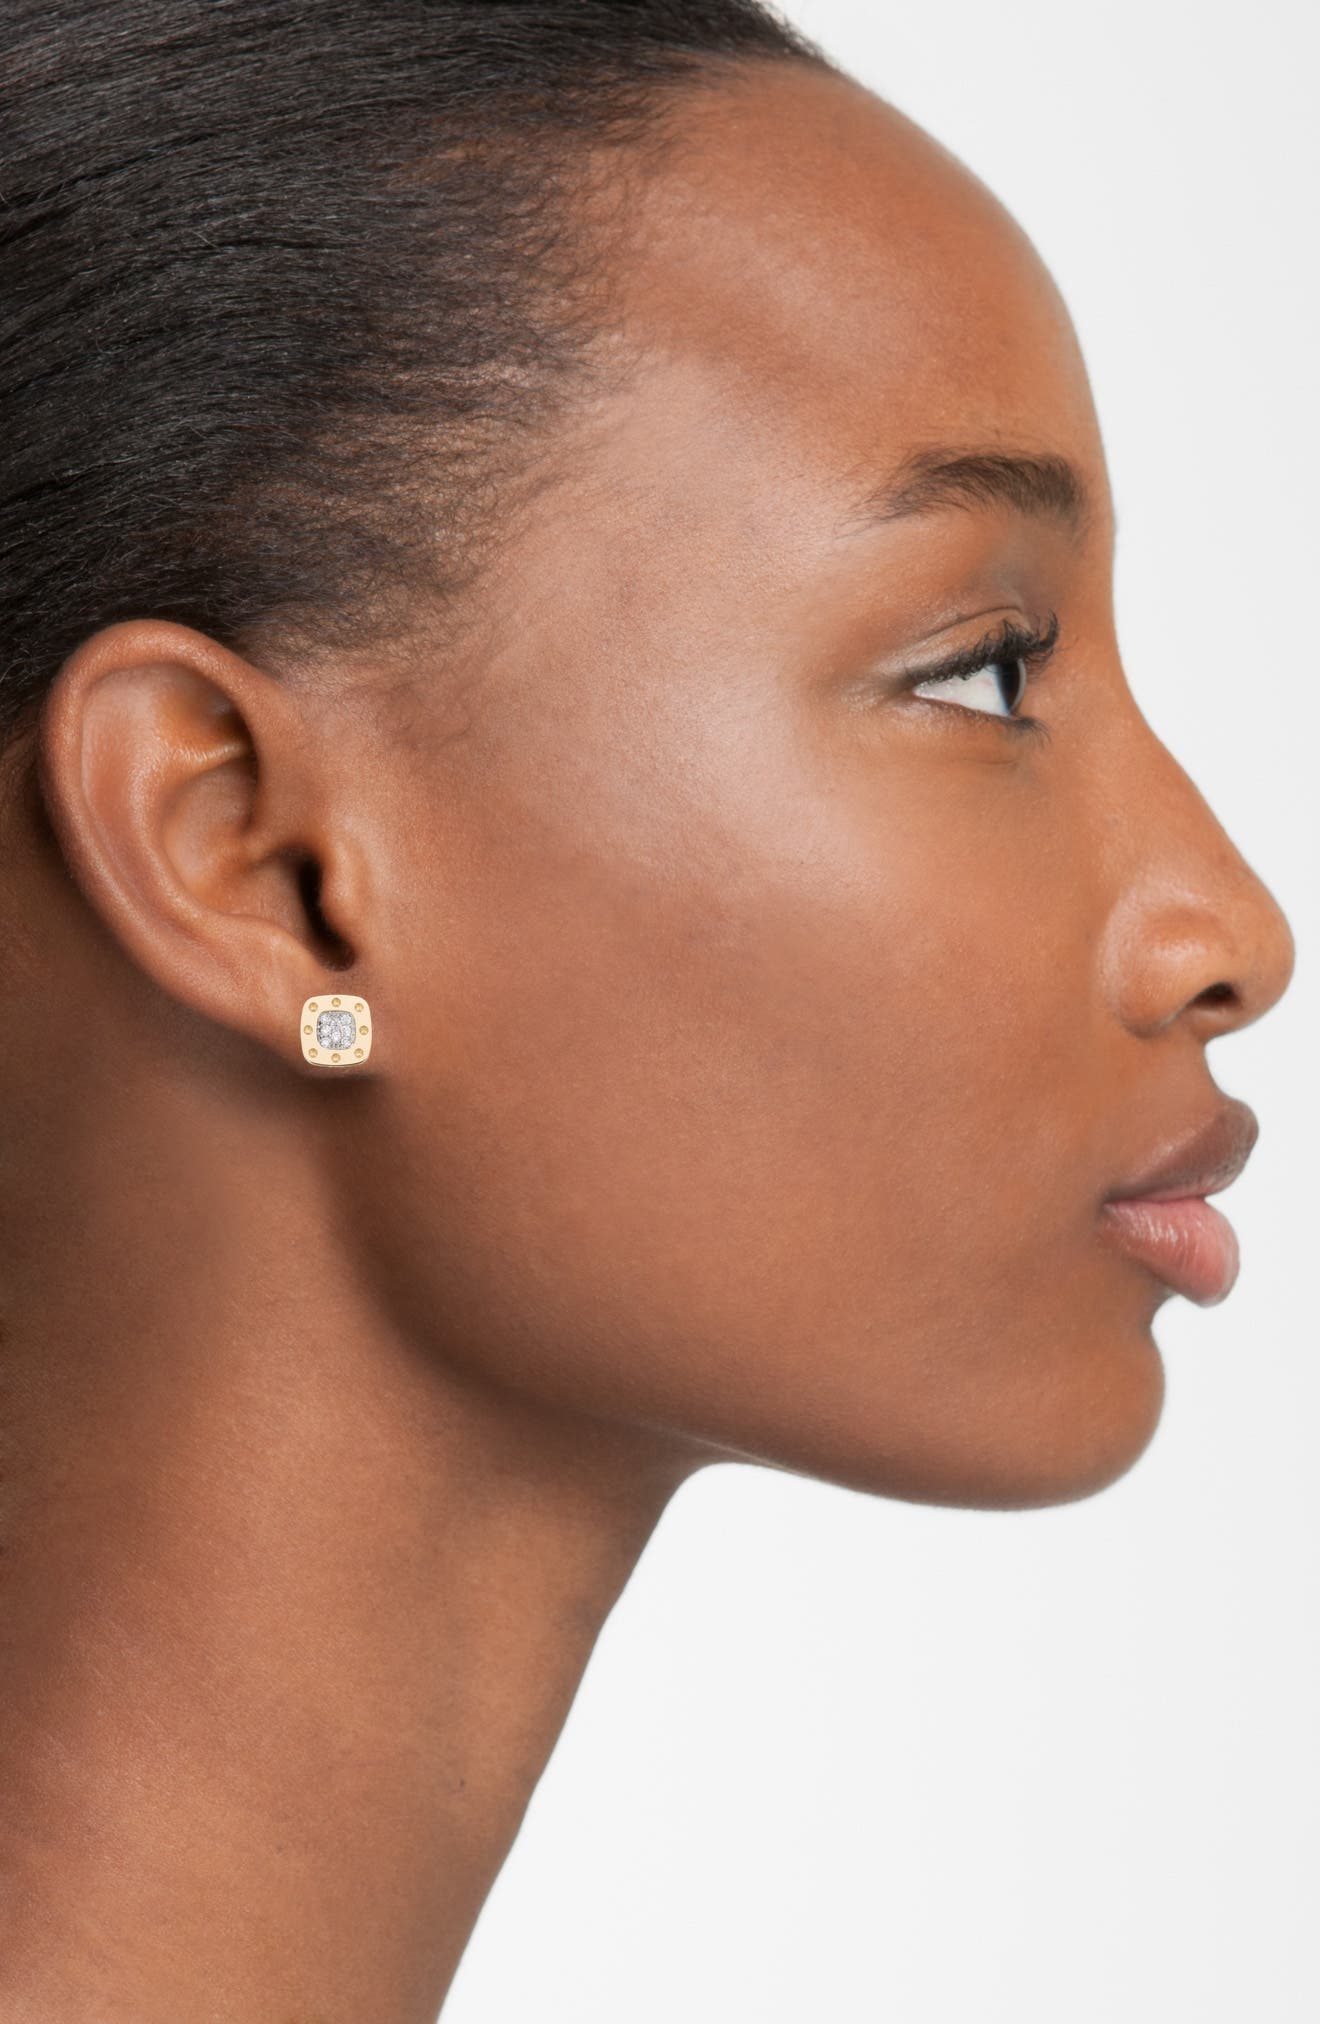 'Pois Moi' Diamond Stud Earrings,                             Alternate thumbnail 2, color,                             YELLOW GOLD